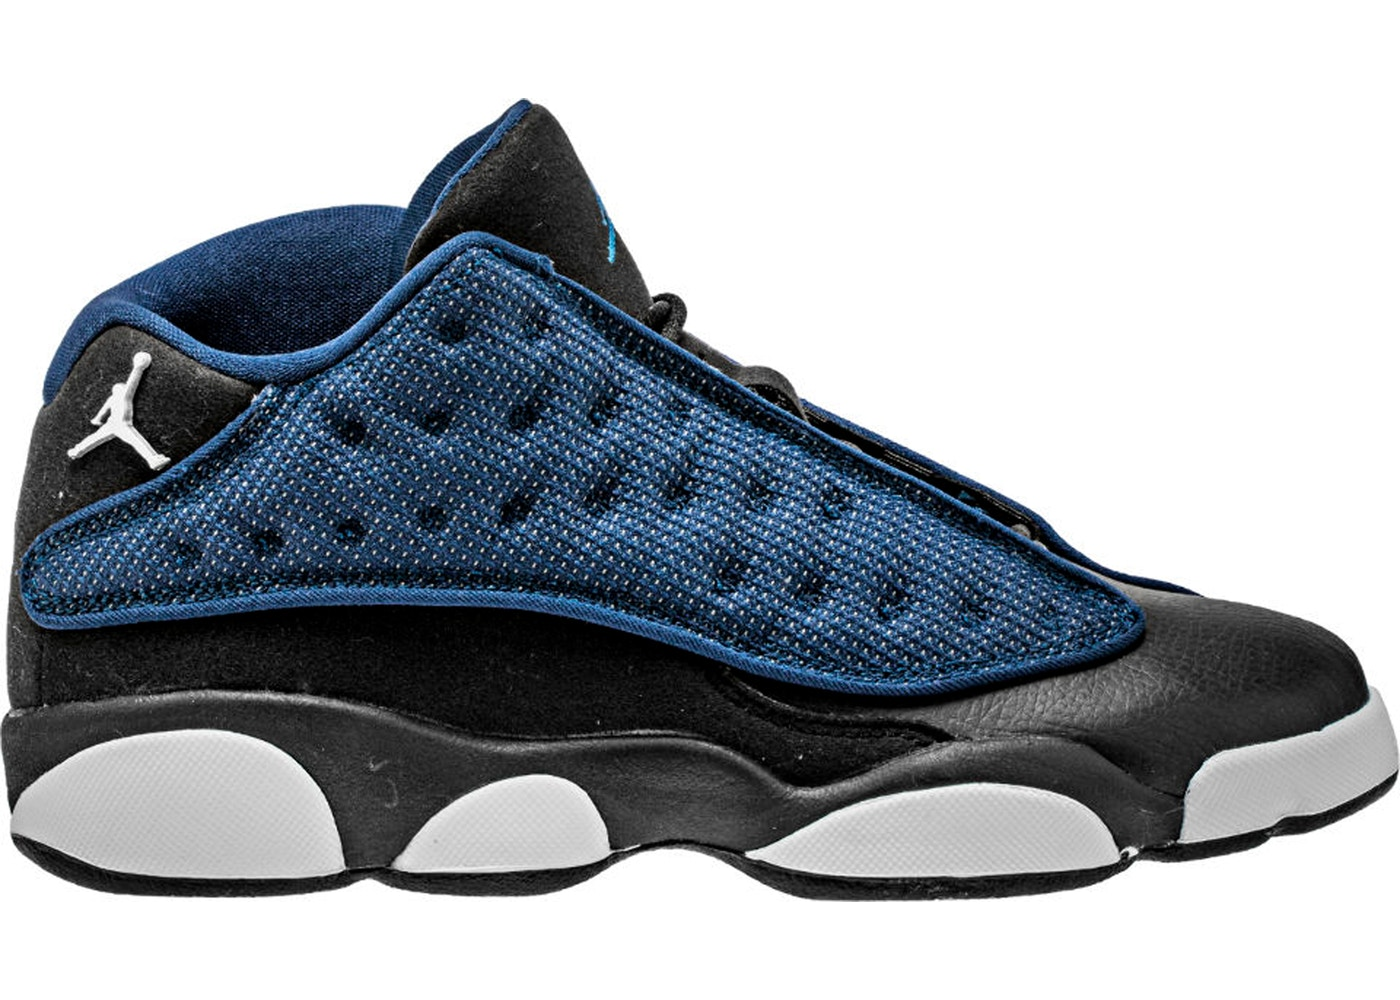 8dc4db5a5d75e Sell. or Ask. Size  6.5Y. View All Bids. Jordan 13 Retro Low Brave Blue ...